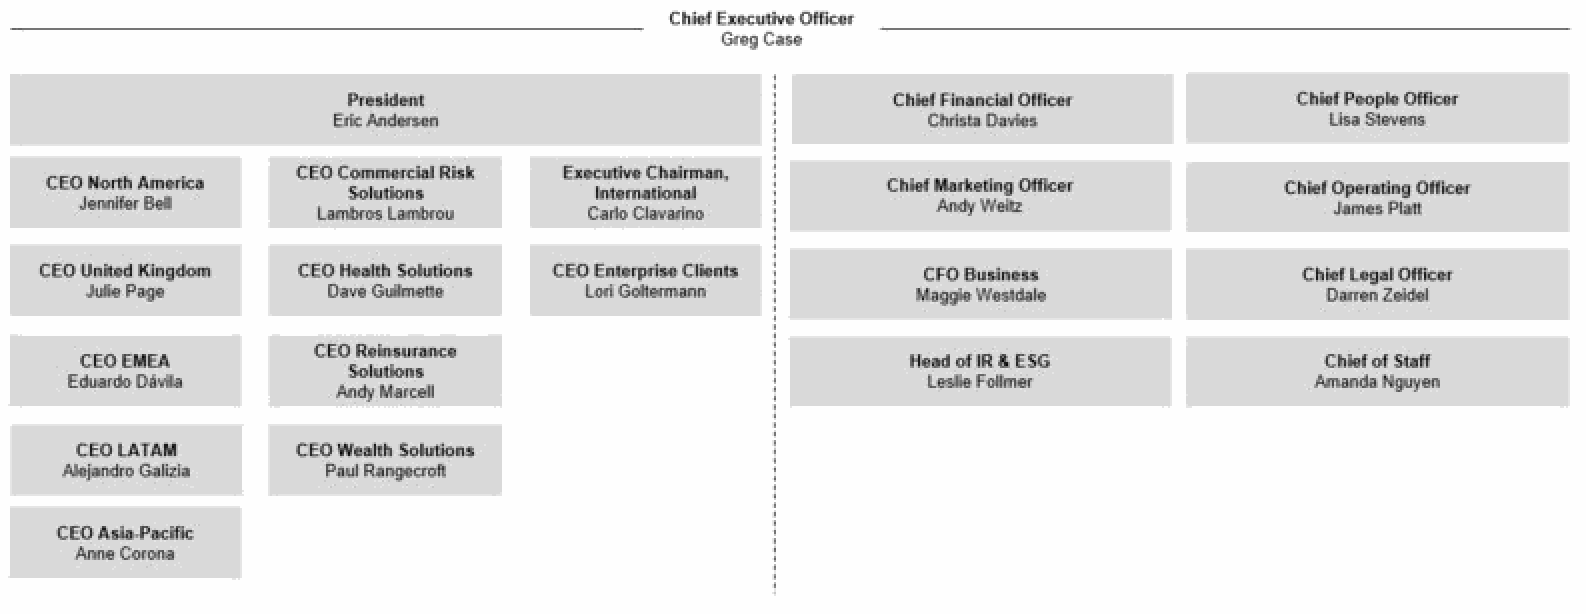 Aon executive team organisation chart